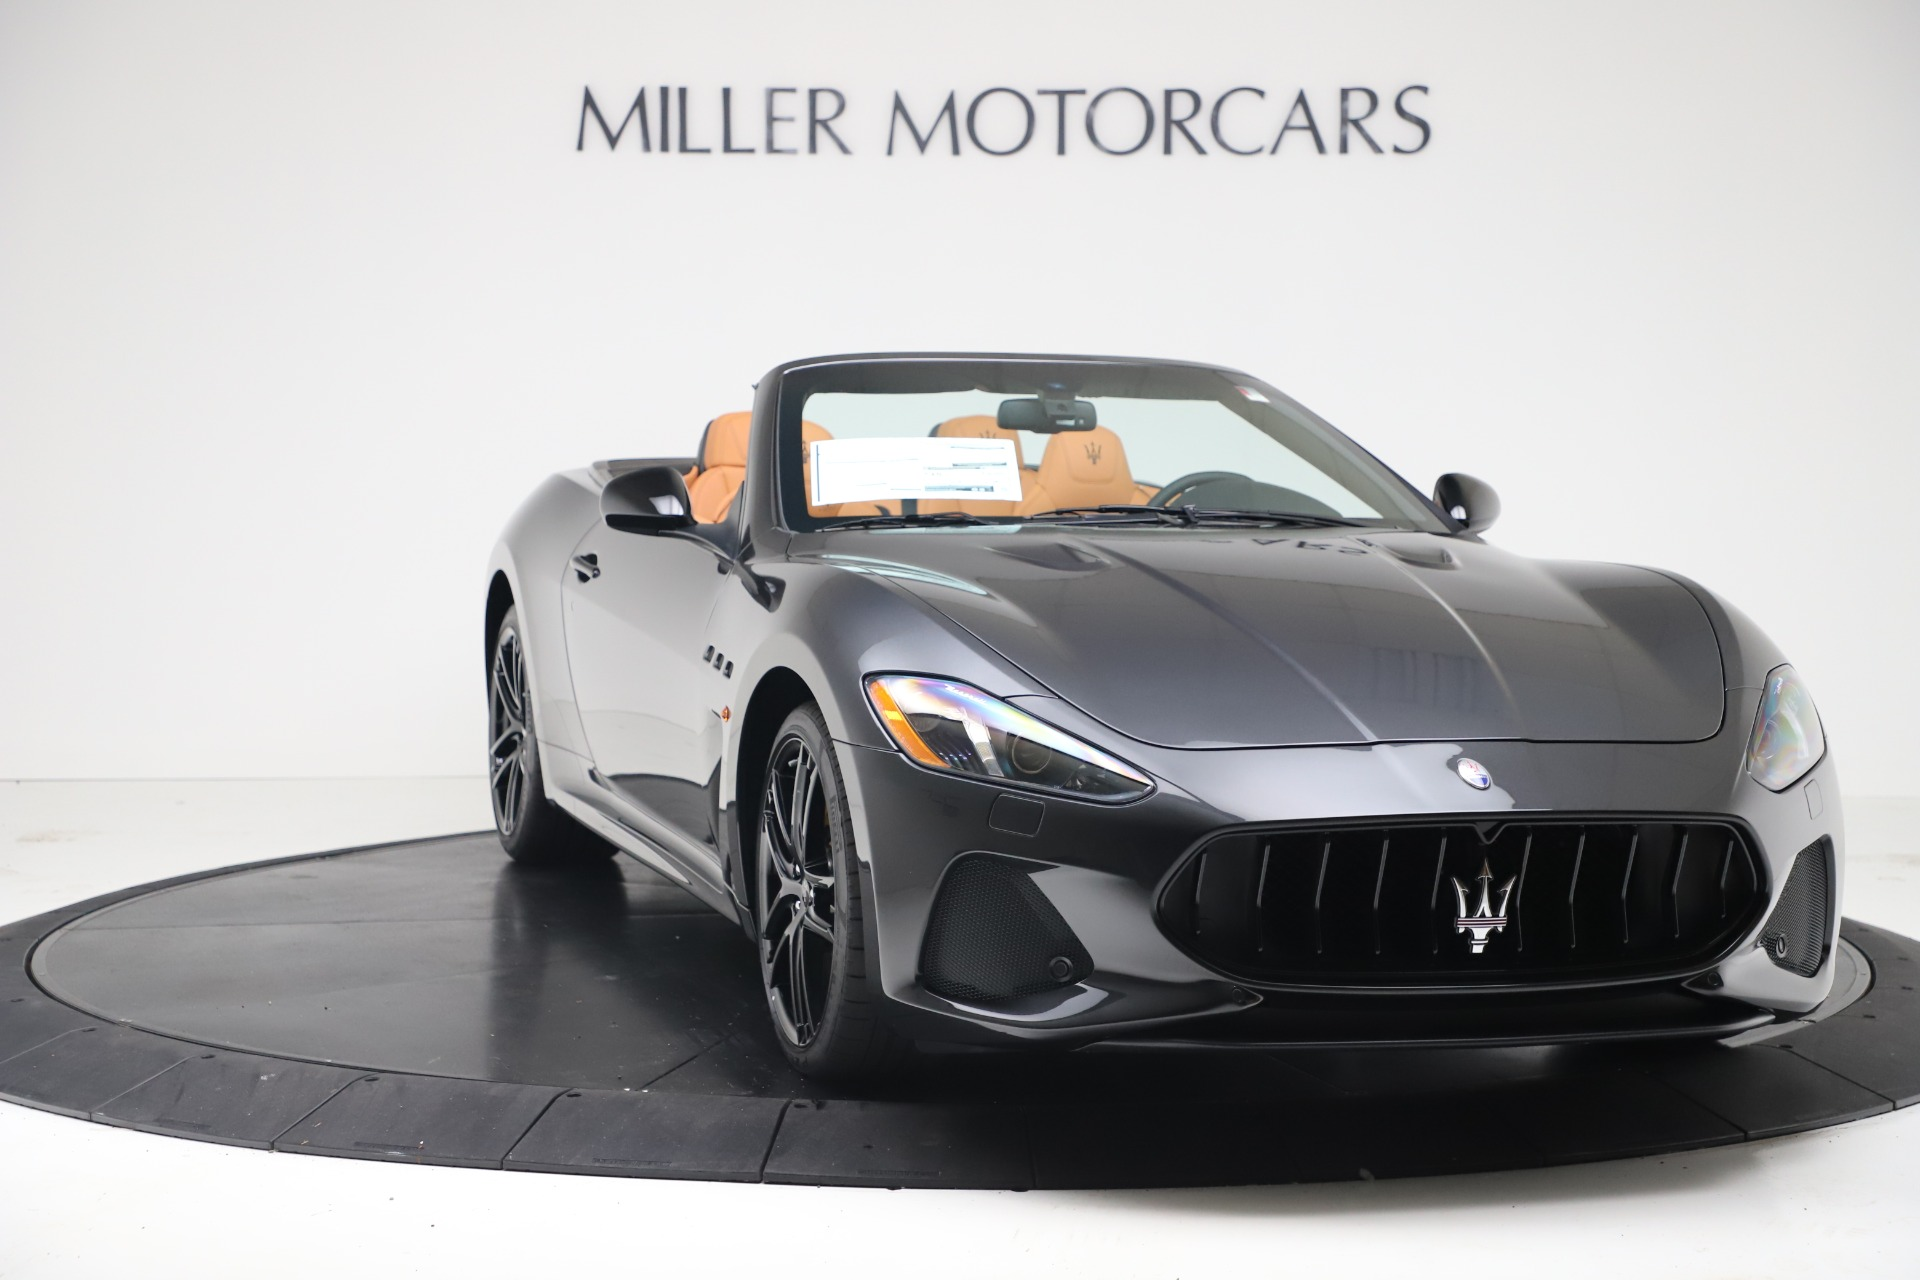 New 2019 Maserati GranTurismo MC Convertible For Sale In Westport, CT 3468_p11